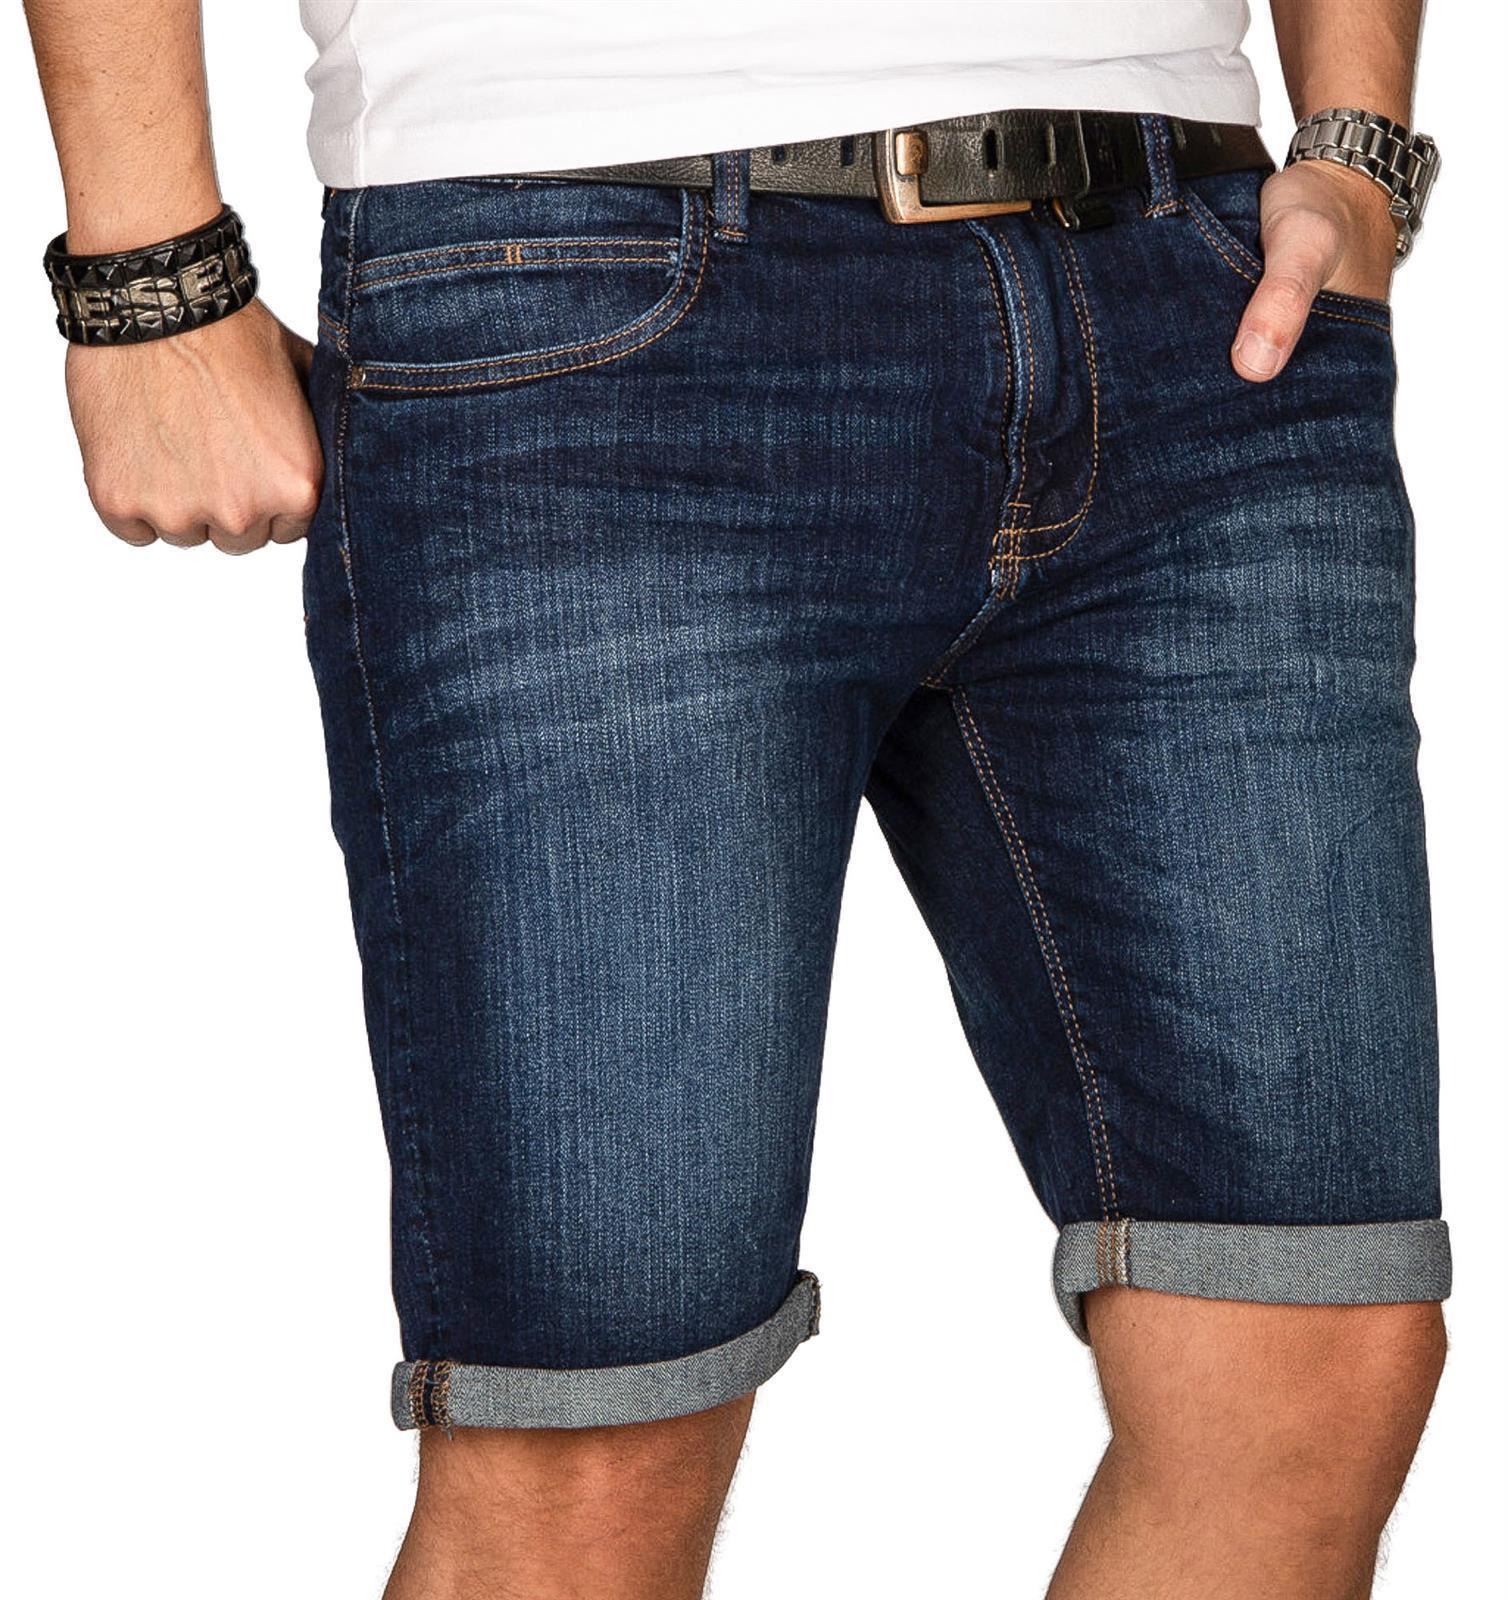 Indicode-Herren-Sommer-Bermuda-Jeans-Shorts-kurze-Hose-Sommerhose-Short-Neu-B556 Indexbild 33